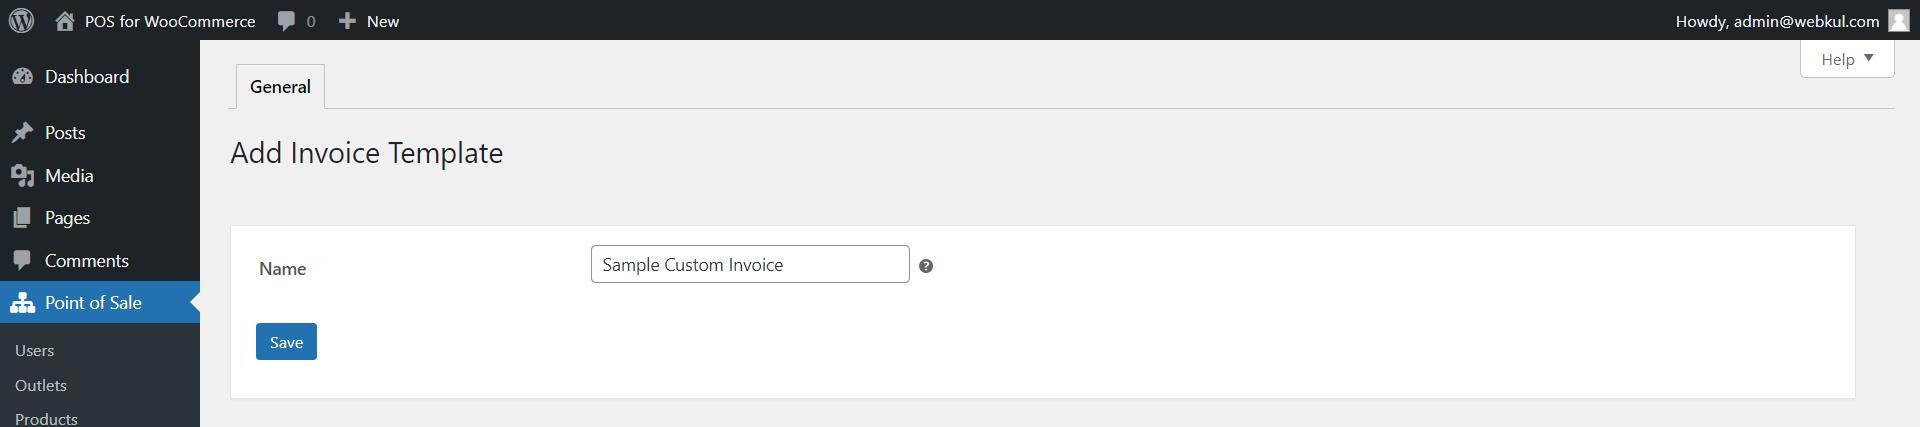 Invoice-Templates-‹-POS-for-—-WordPress